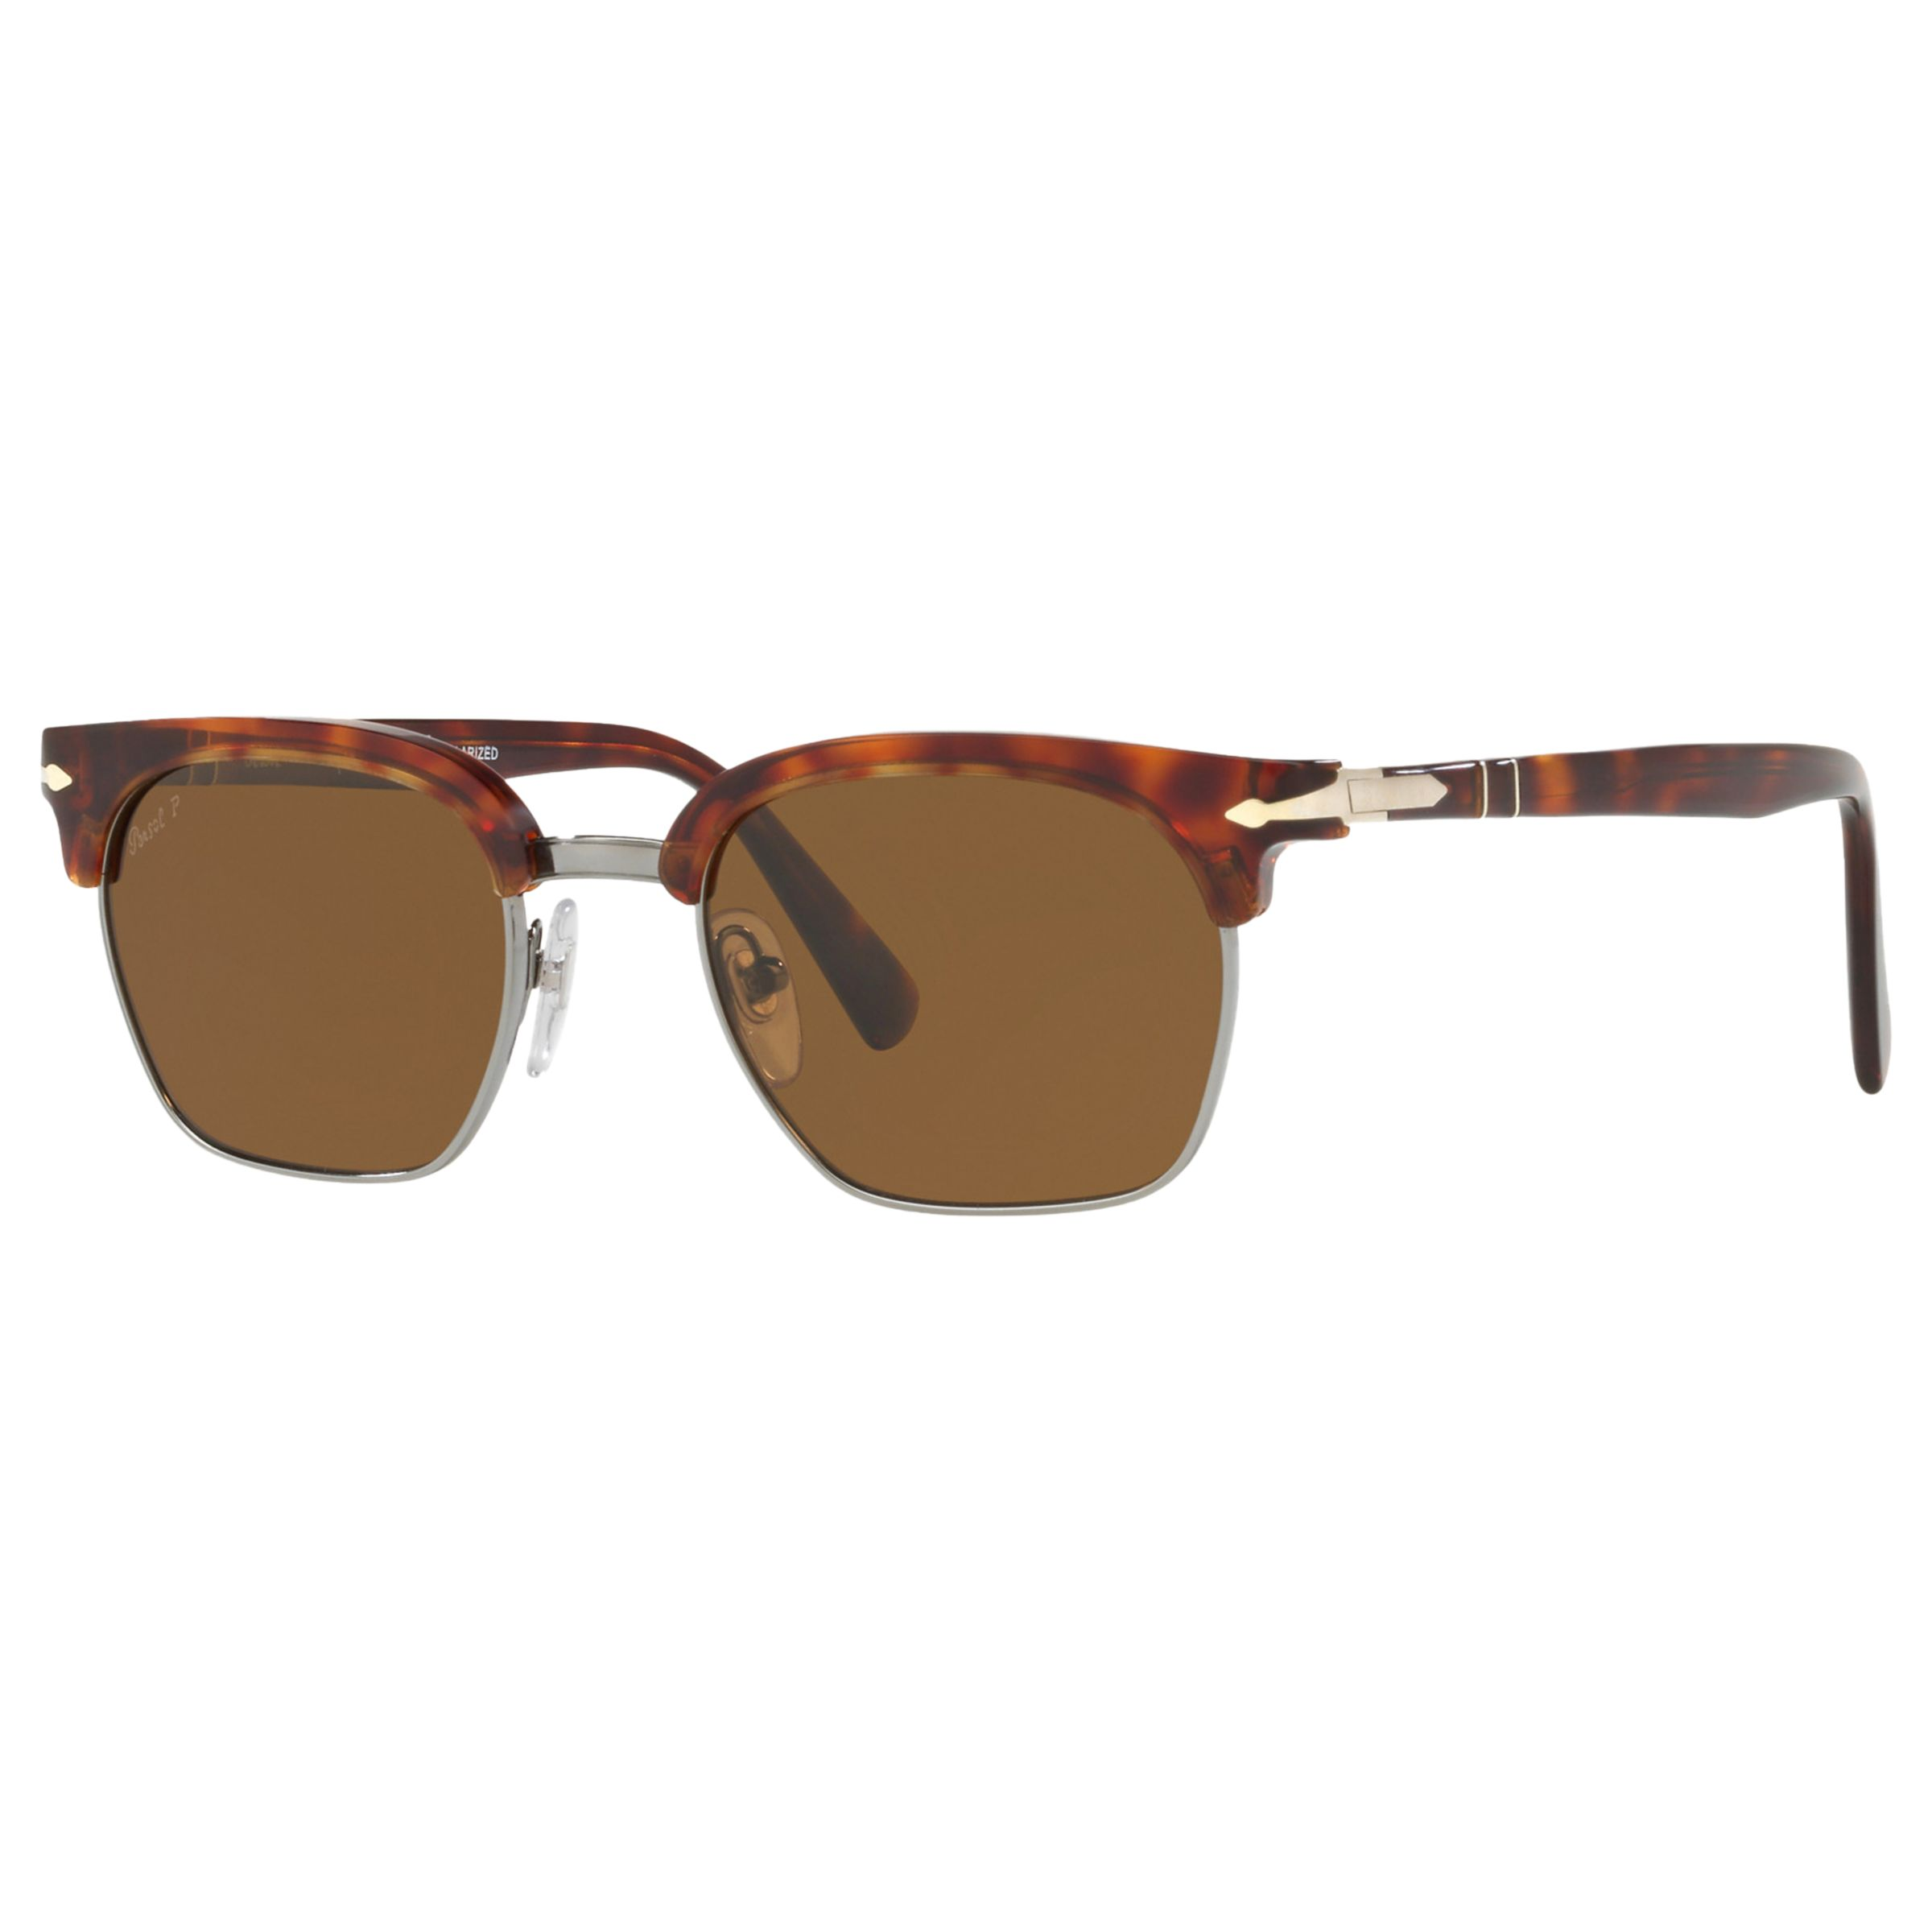 Persol Persol PO3199S Polarised Unisex Square Sunglasses